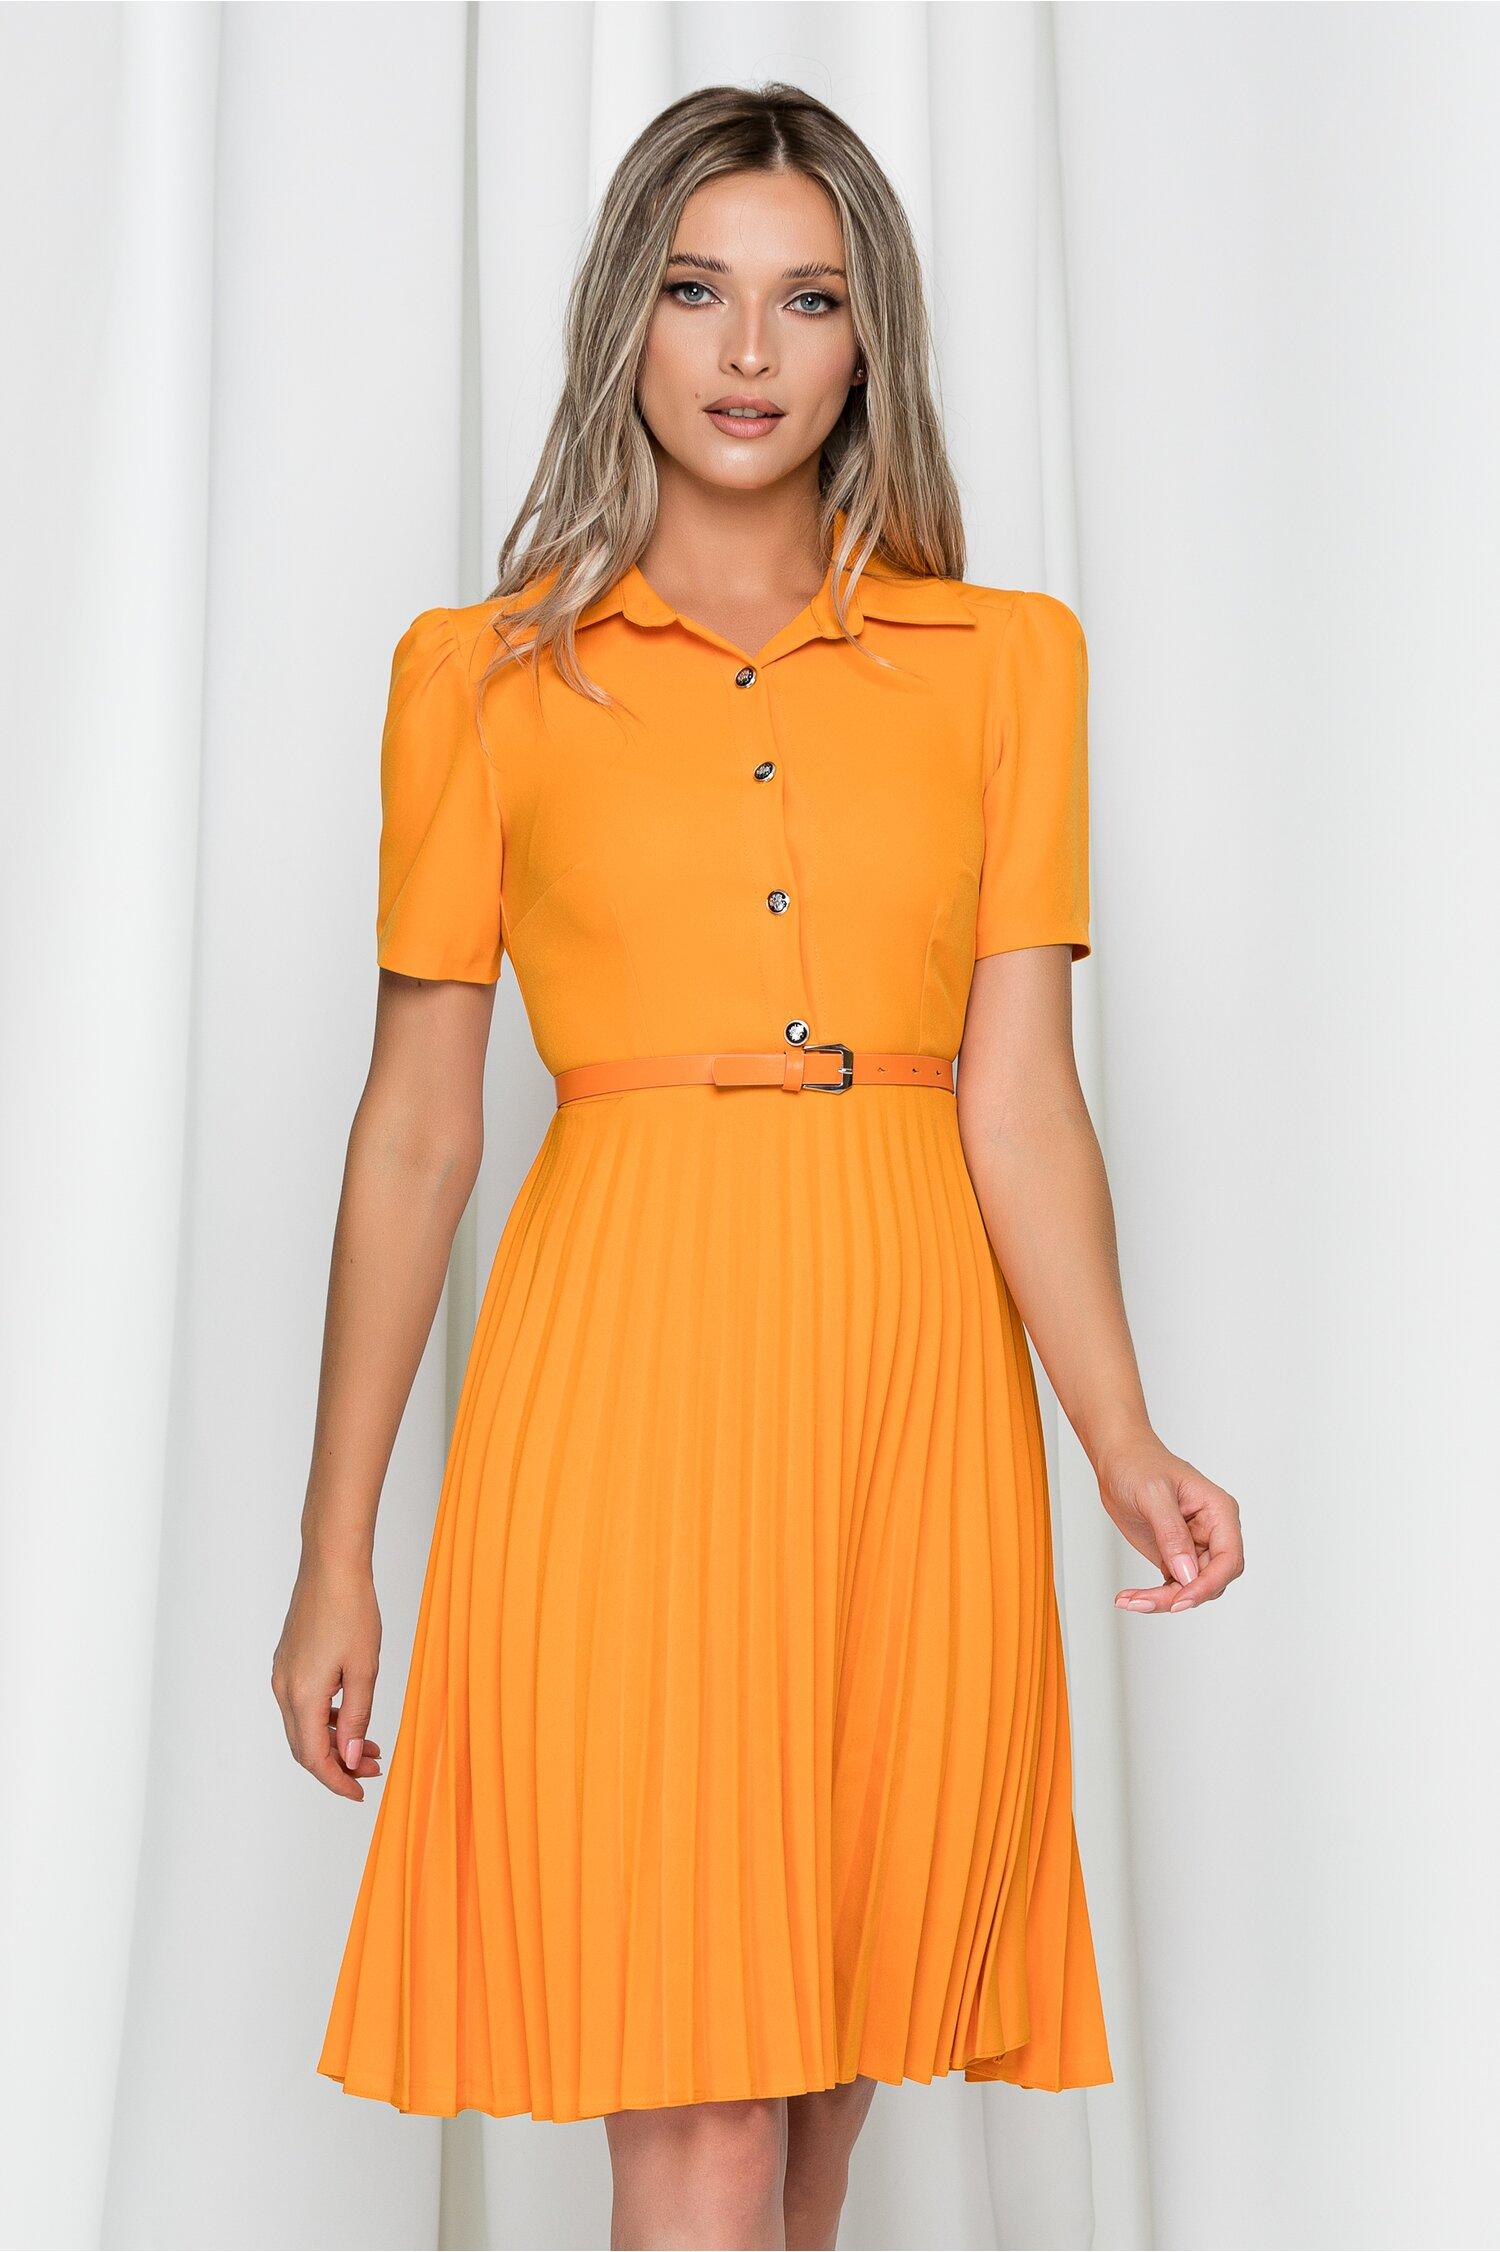 Rochie Kalliope portocalie cu guler tip camasa si pliuri pe fusta